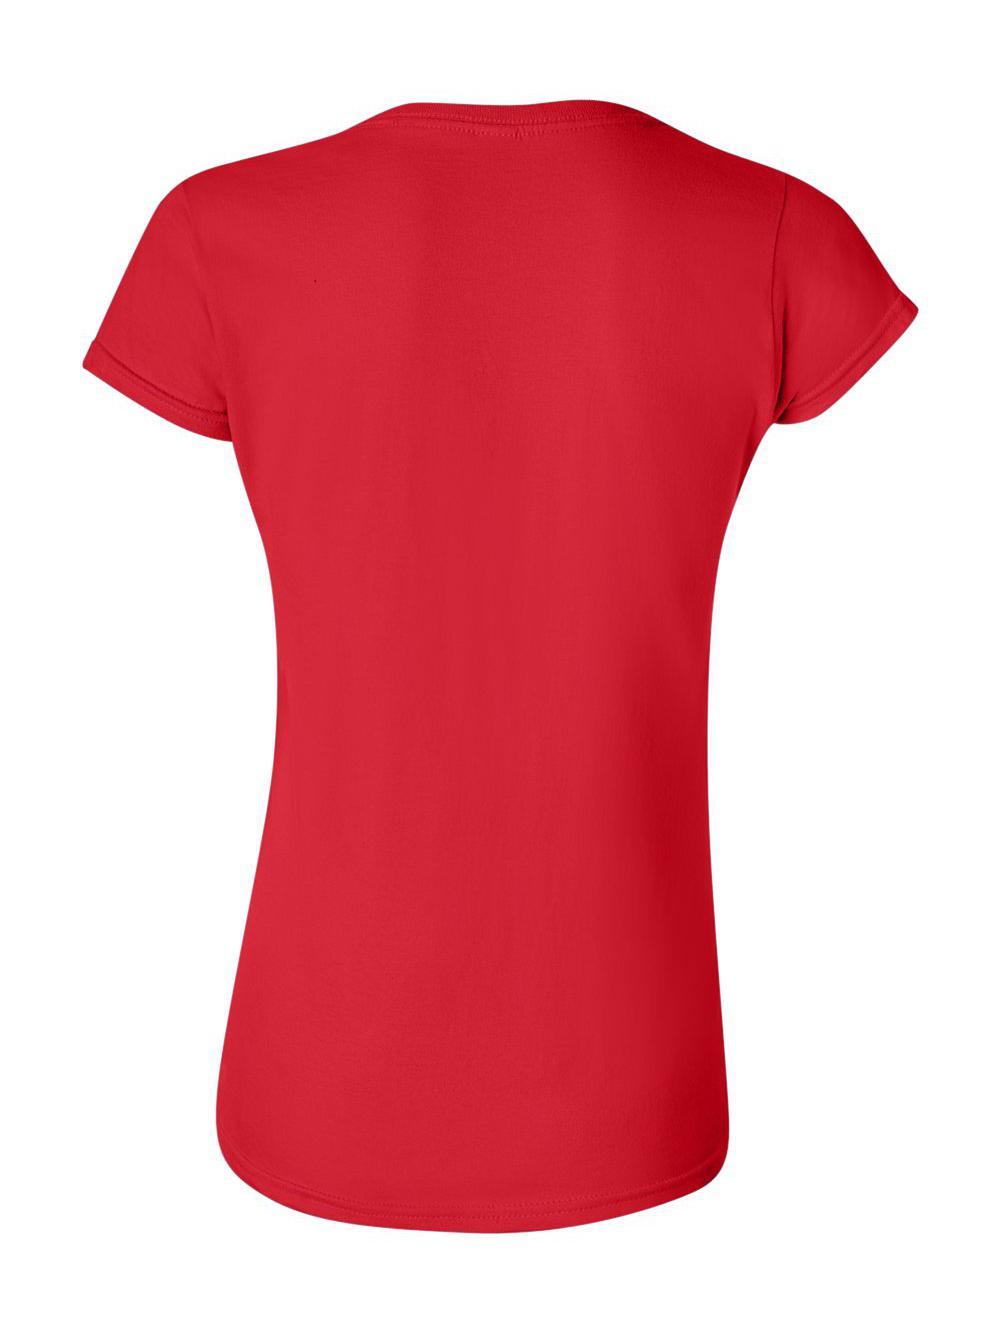 Gildan-Softstyle-Women-039-s-T-Shirt-64000L thumbnail 37